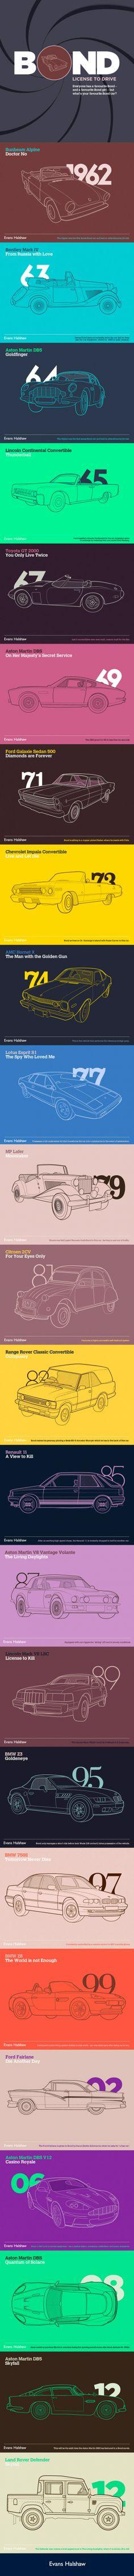 James Bond cars infographic